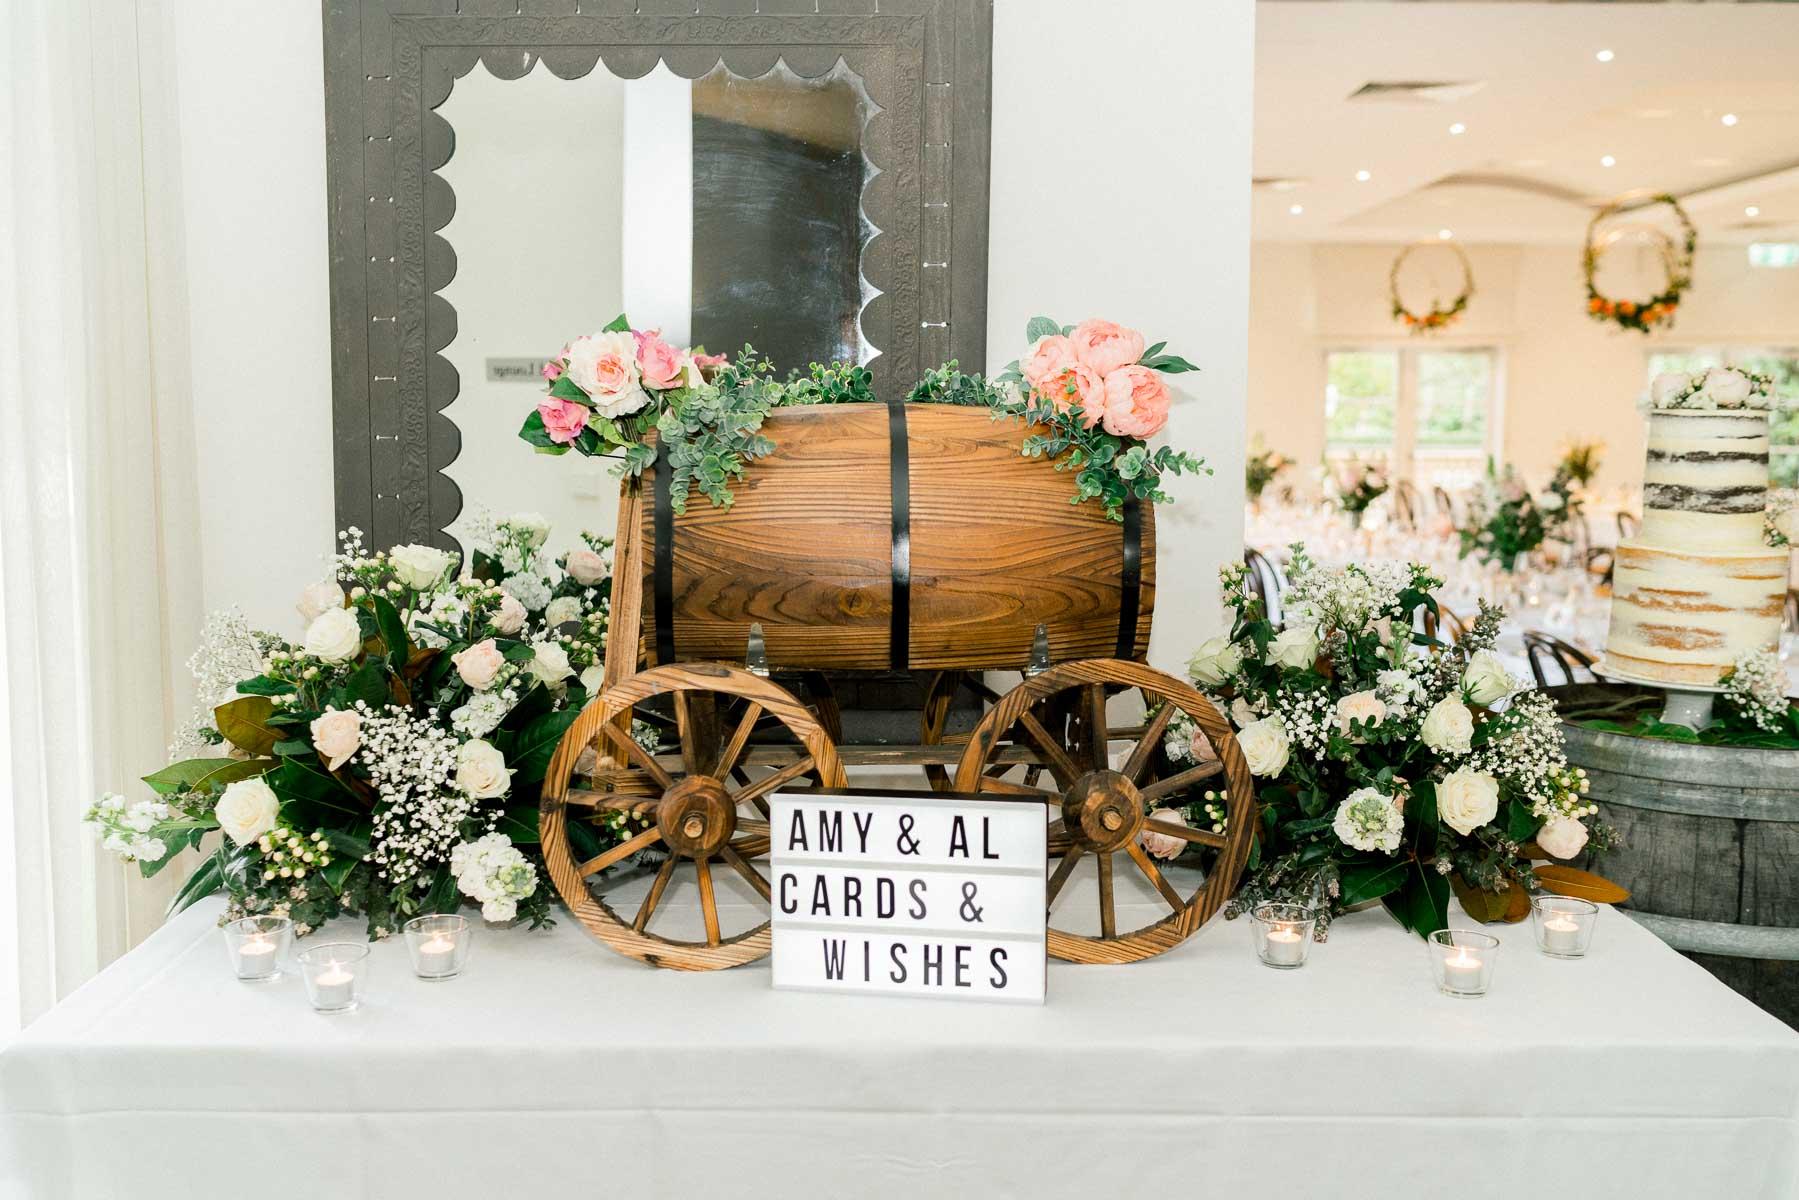 lindenderry-wedding-heart+soul-weddings-amy-alain-03847.jpg